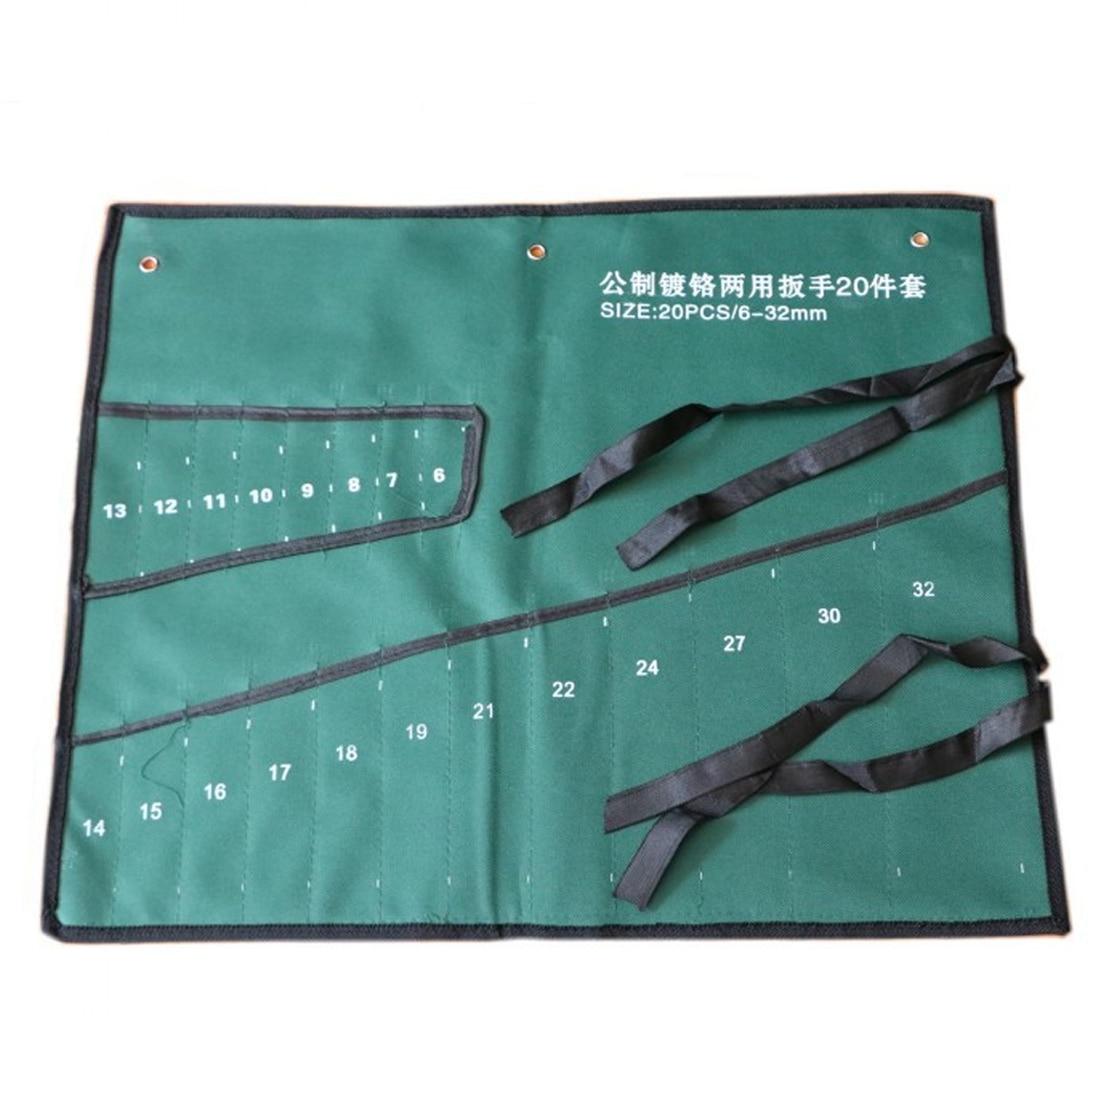 Hardware Kit Pockets Double Opening Offset Ring Spanner Kit Case Tool Bag Spanner Wrench Roll Up Storage Organizer Bag